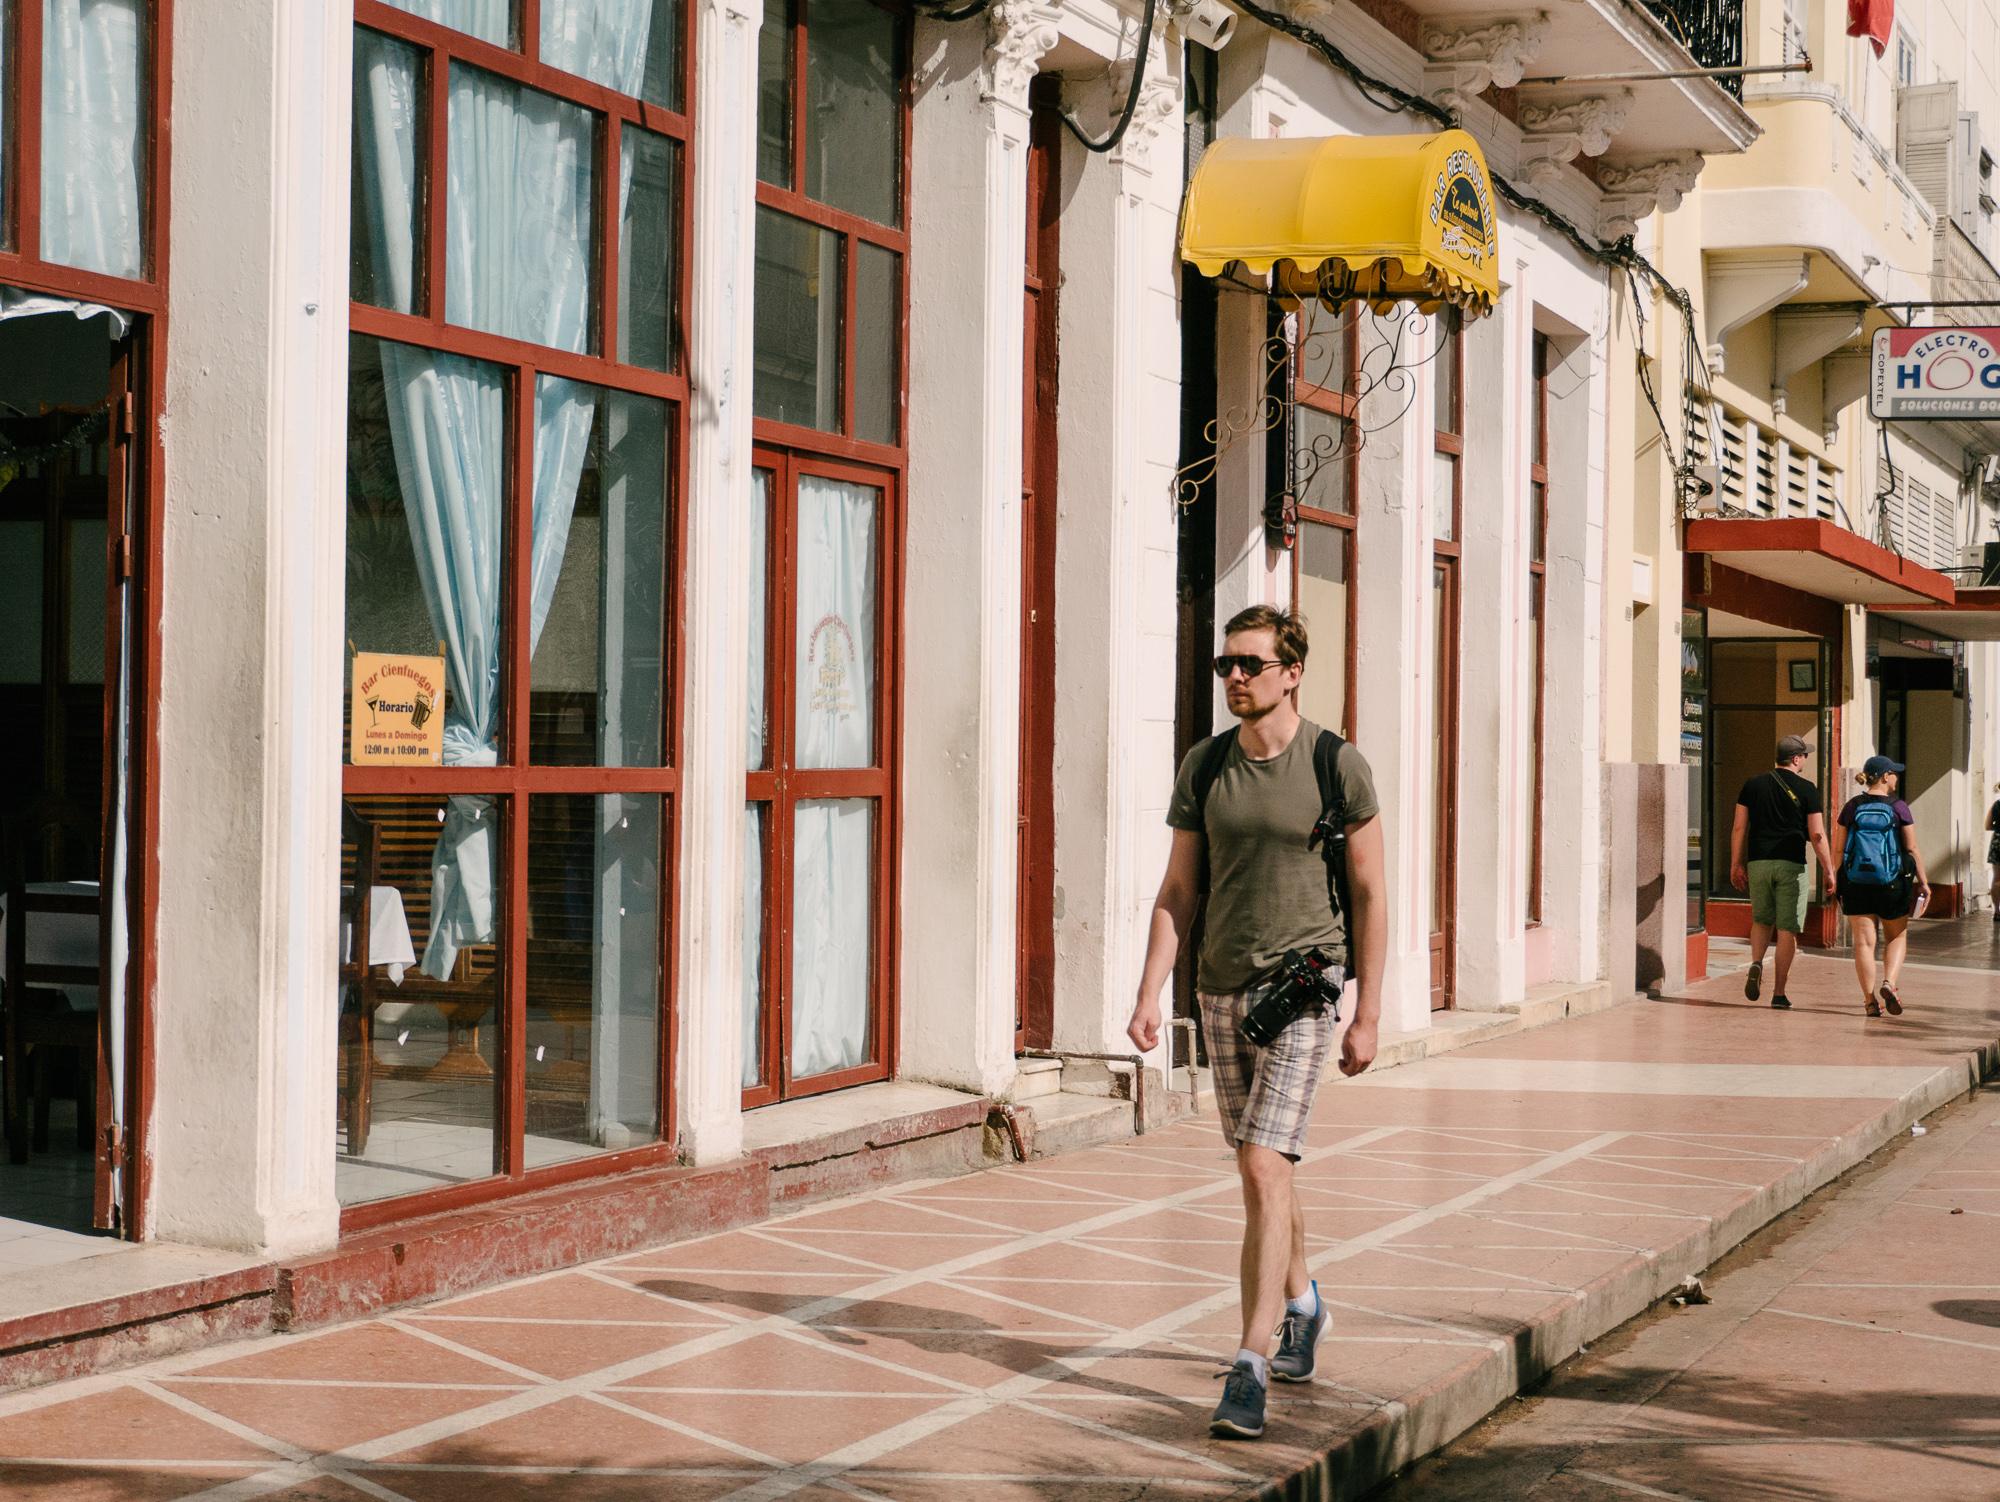 Pedestrian shopping street in Cienfuegos